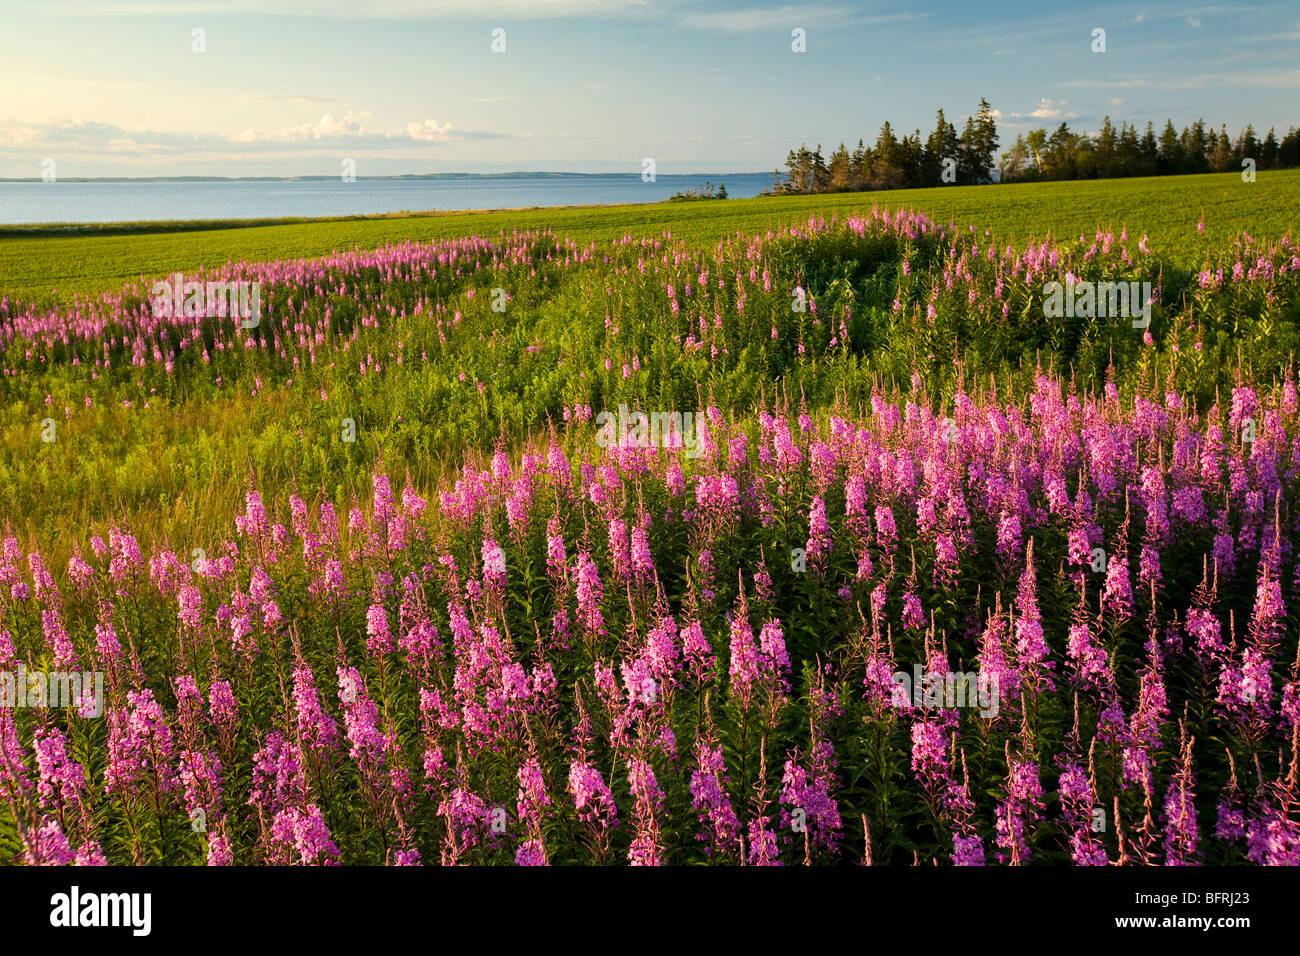 fireweed, Point Prim, Prince Edward Island, Canada - Stock Image